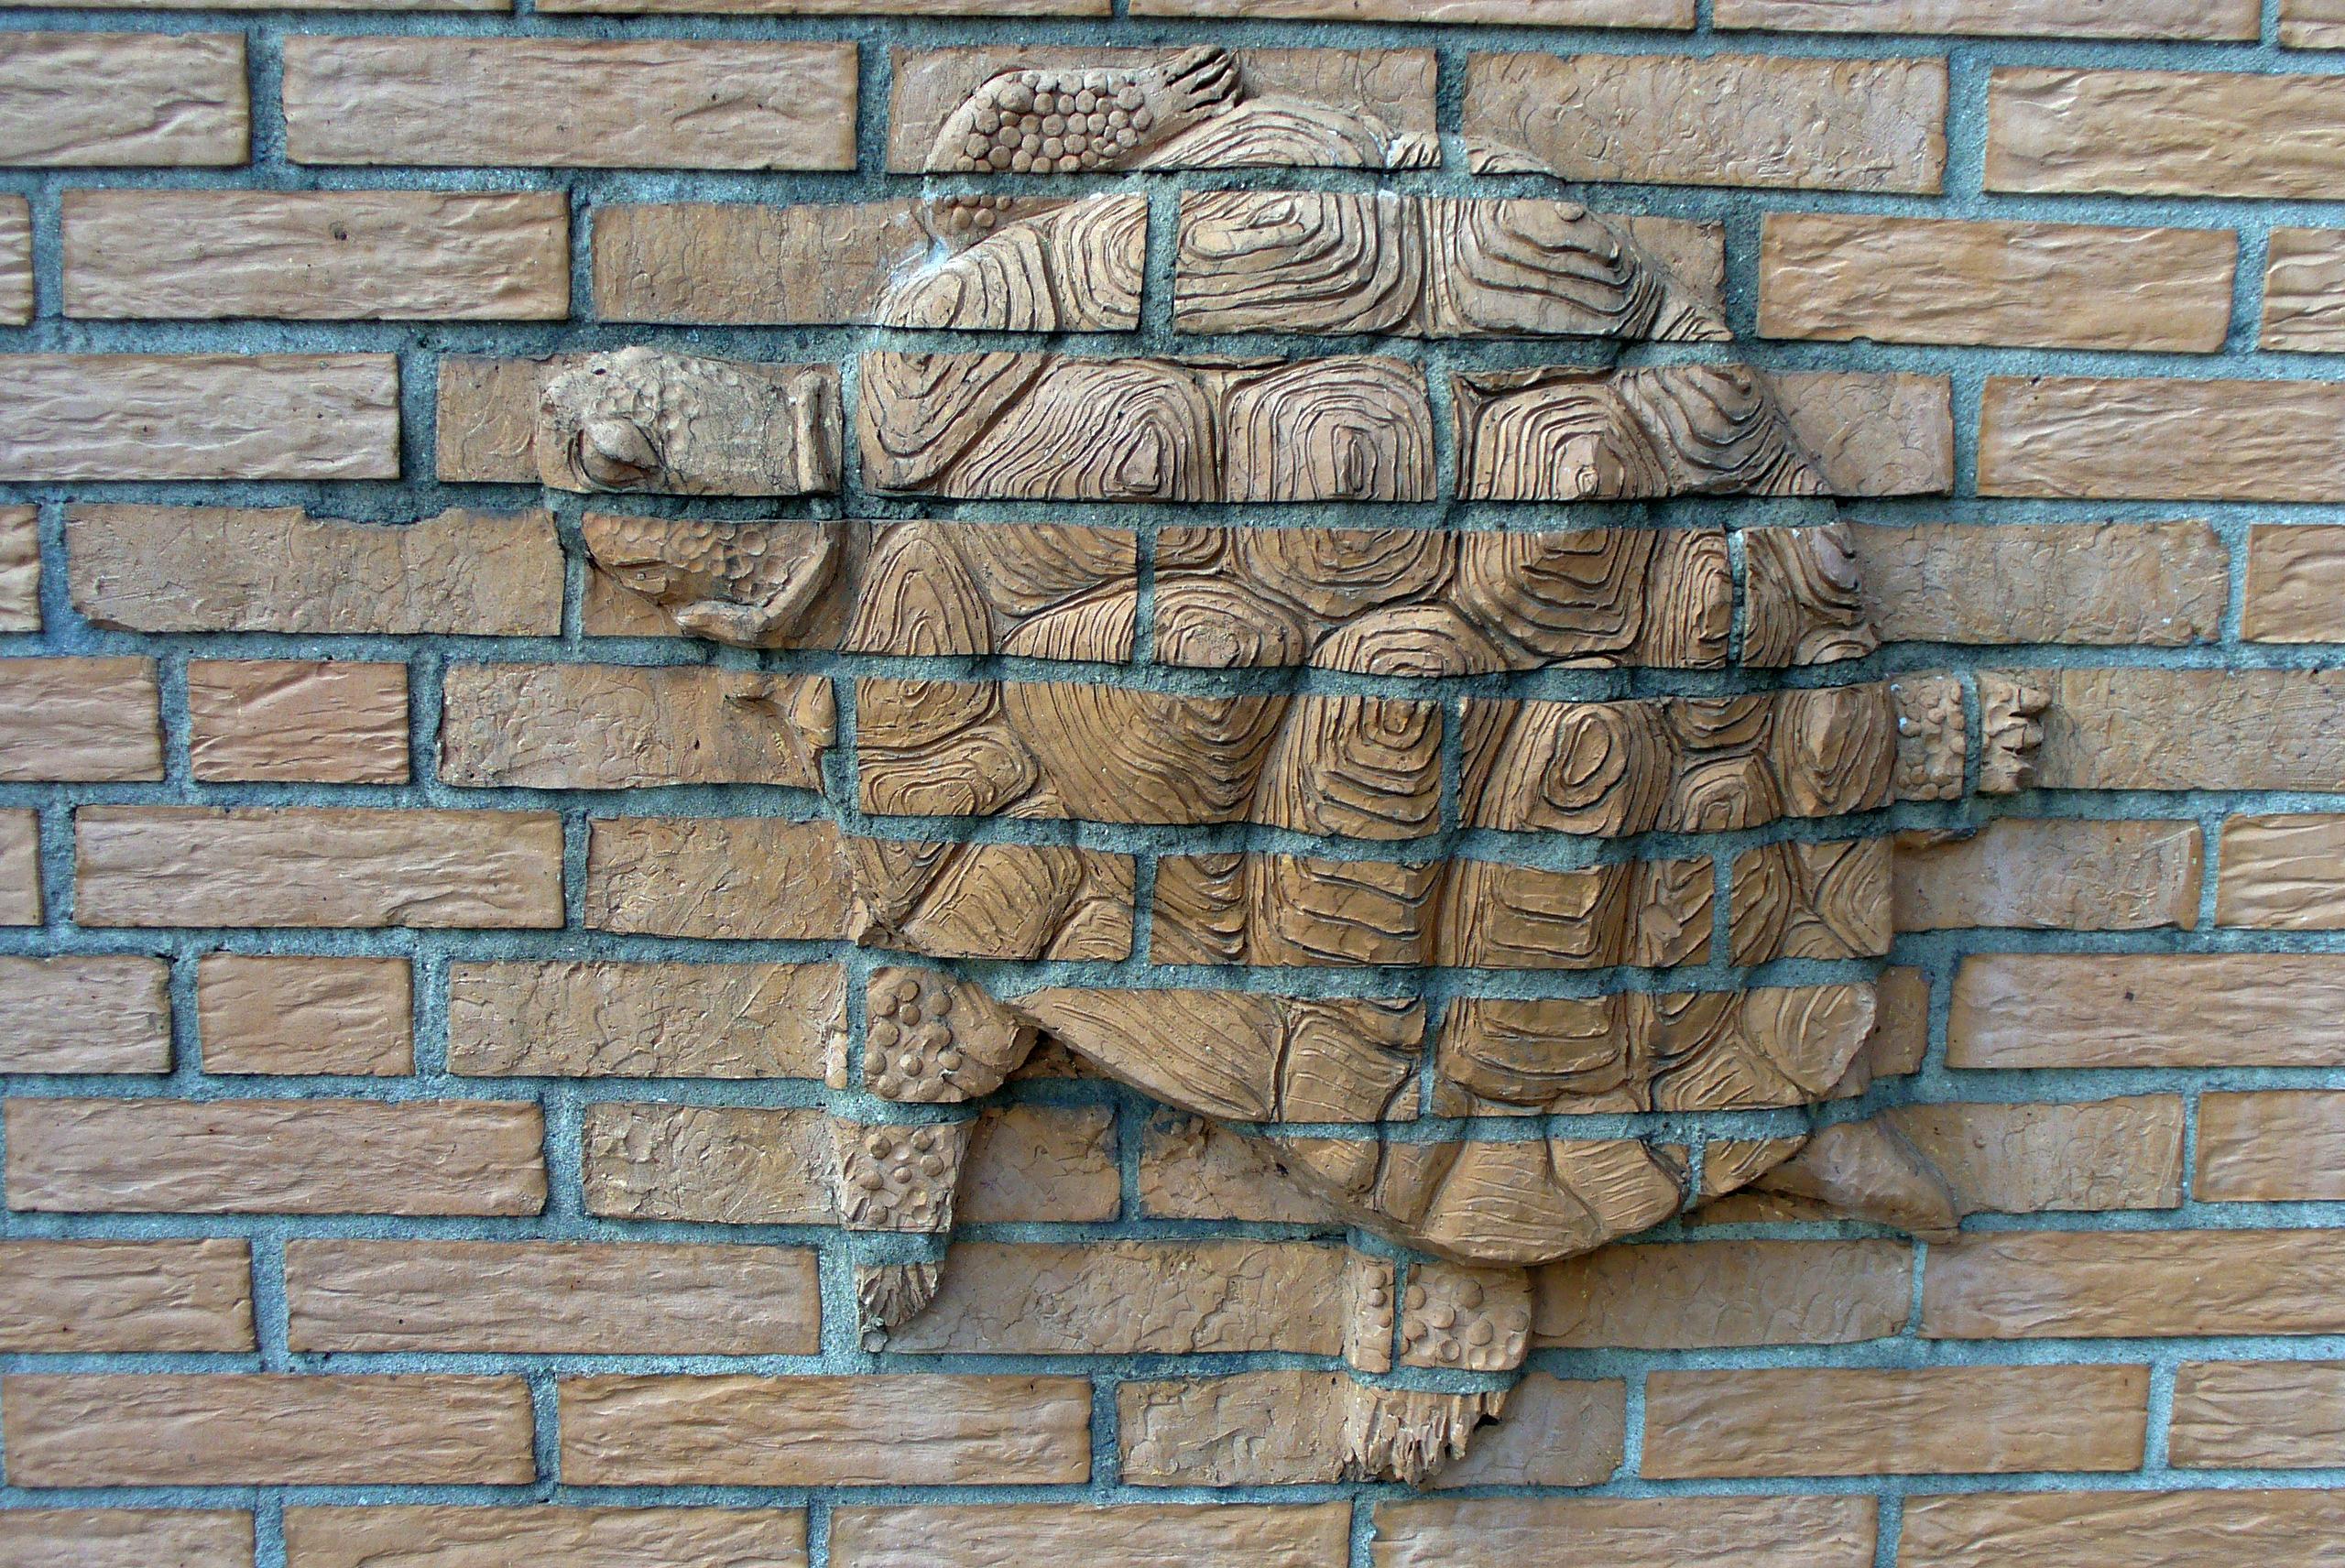 Auf Schildkrötensafari mit Elke Wallrapp (Folge 12)